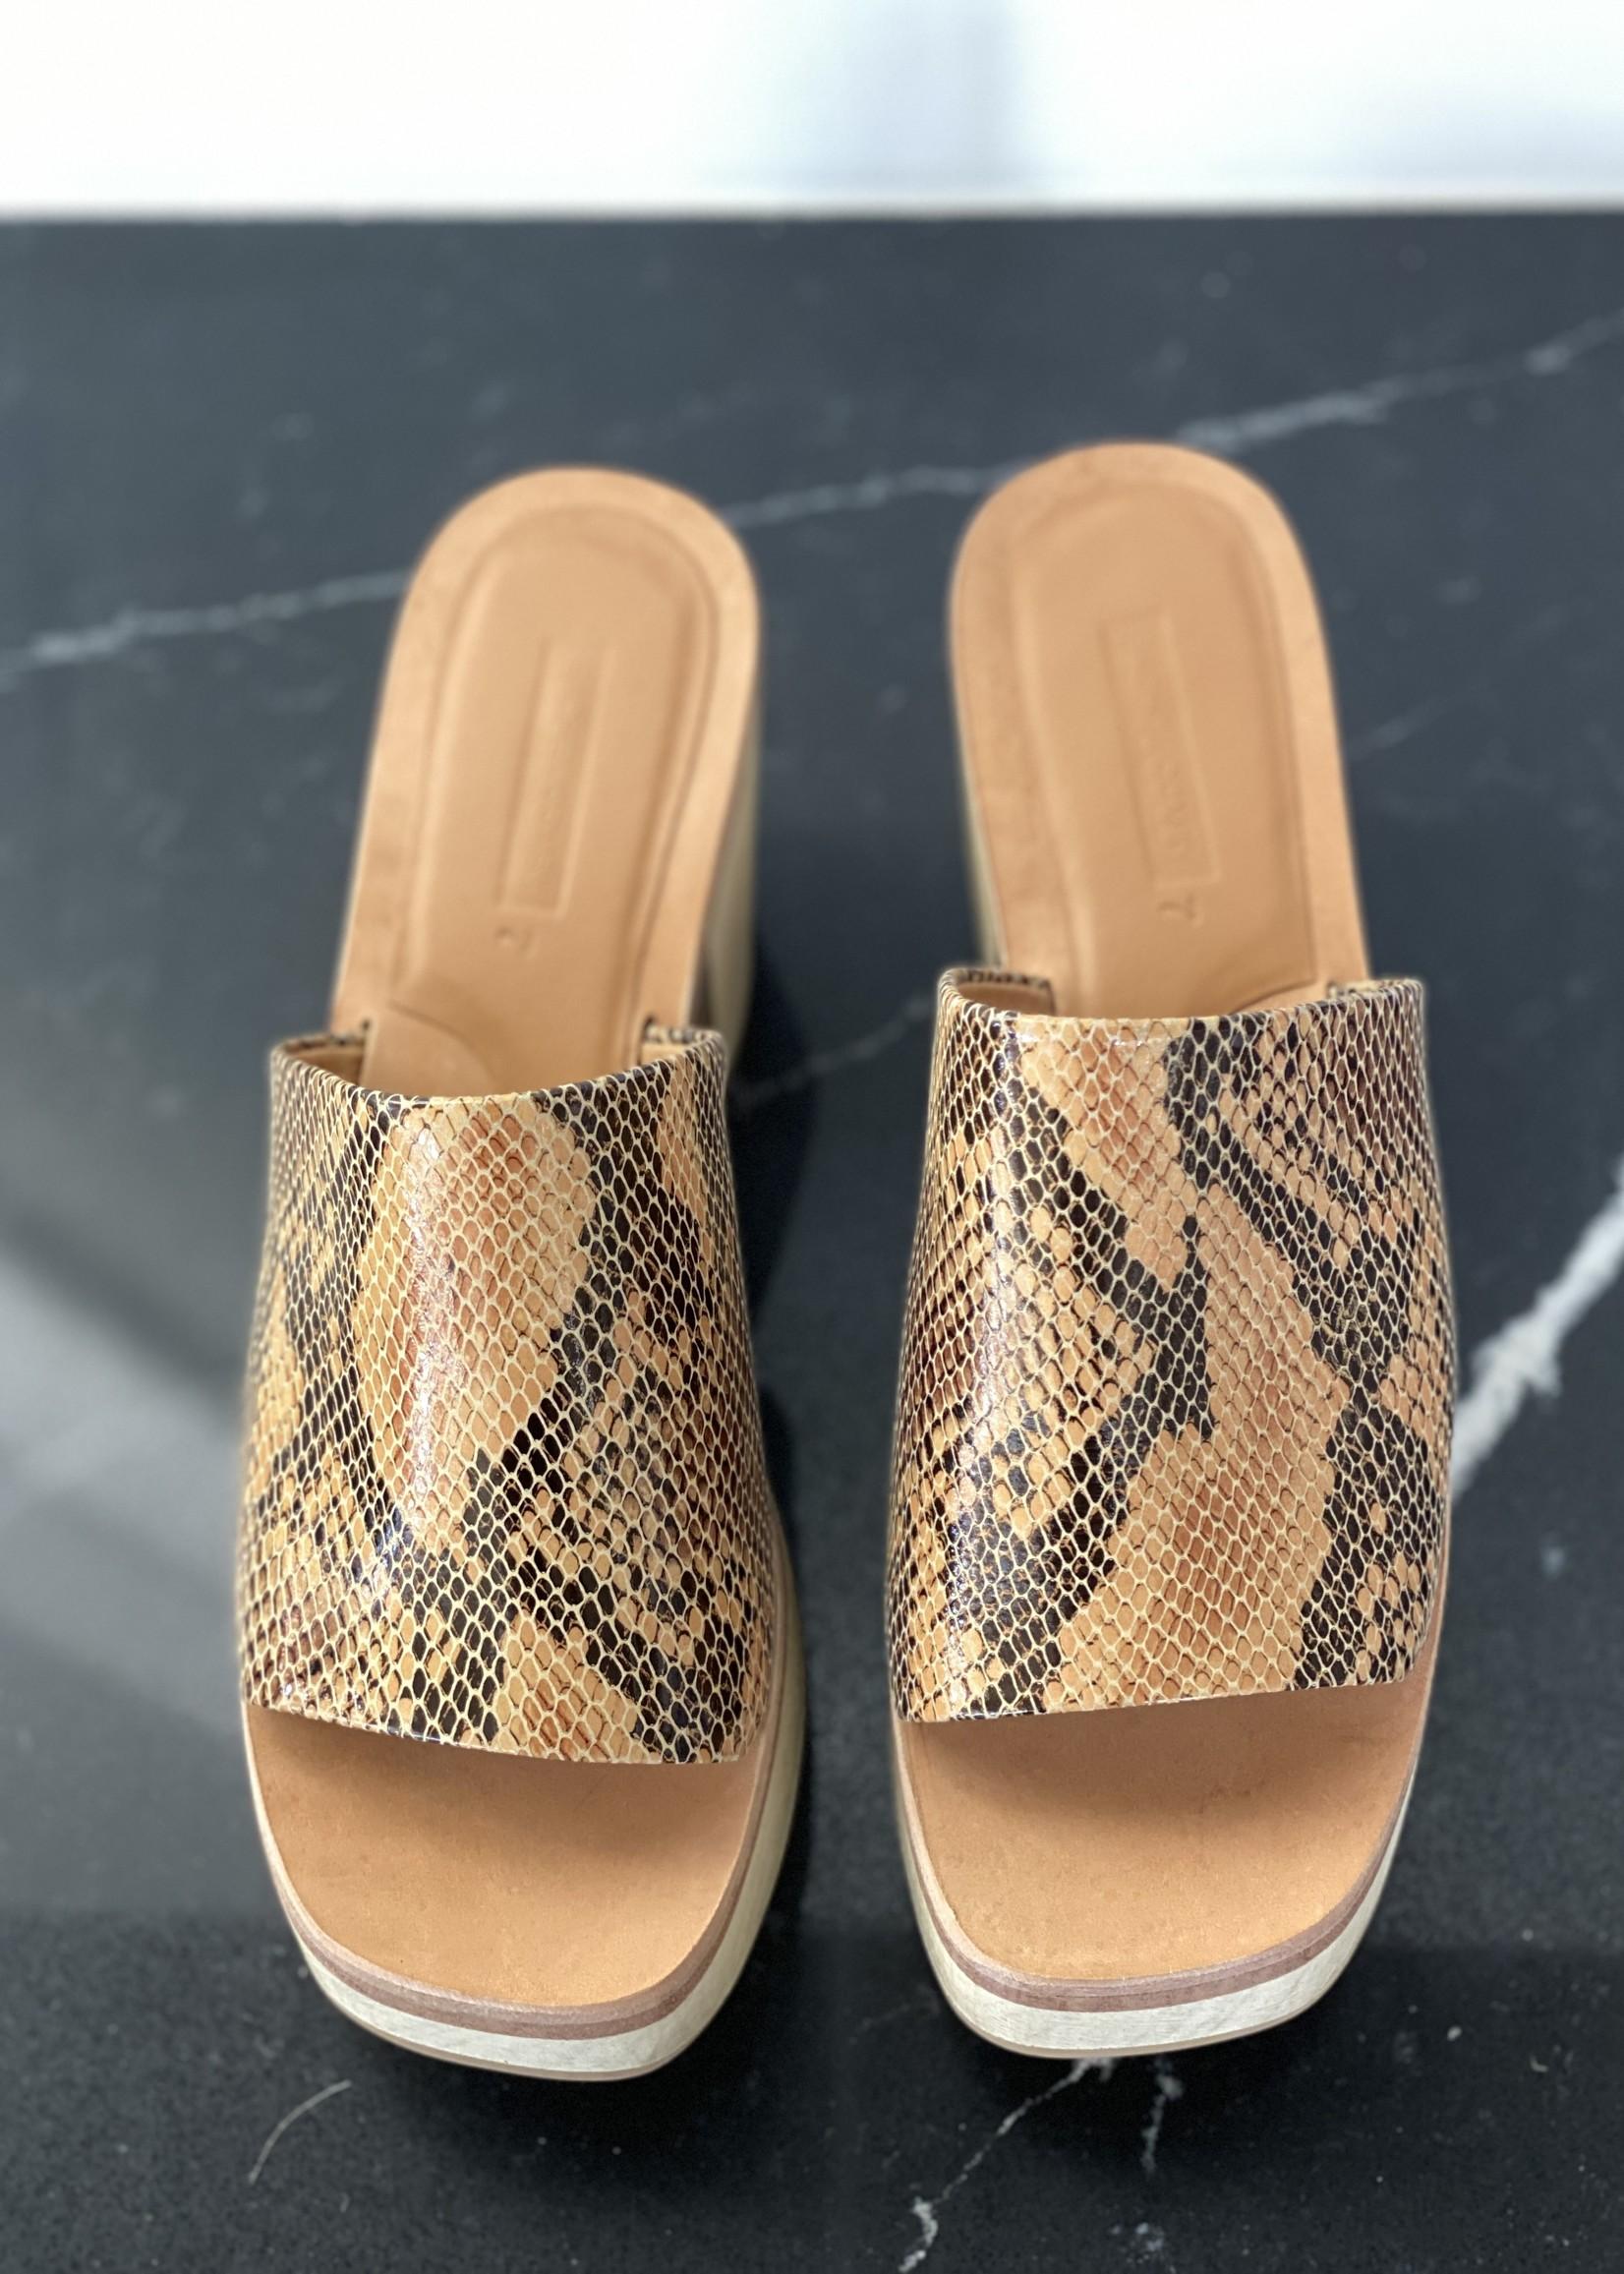 Rachel Comey Wood Clog Sandal in Bone Snake Print